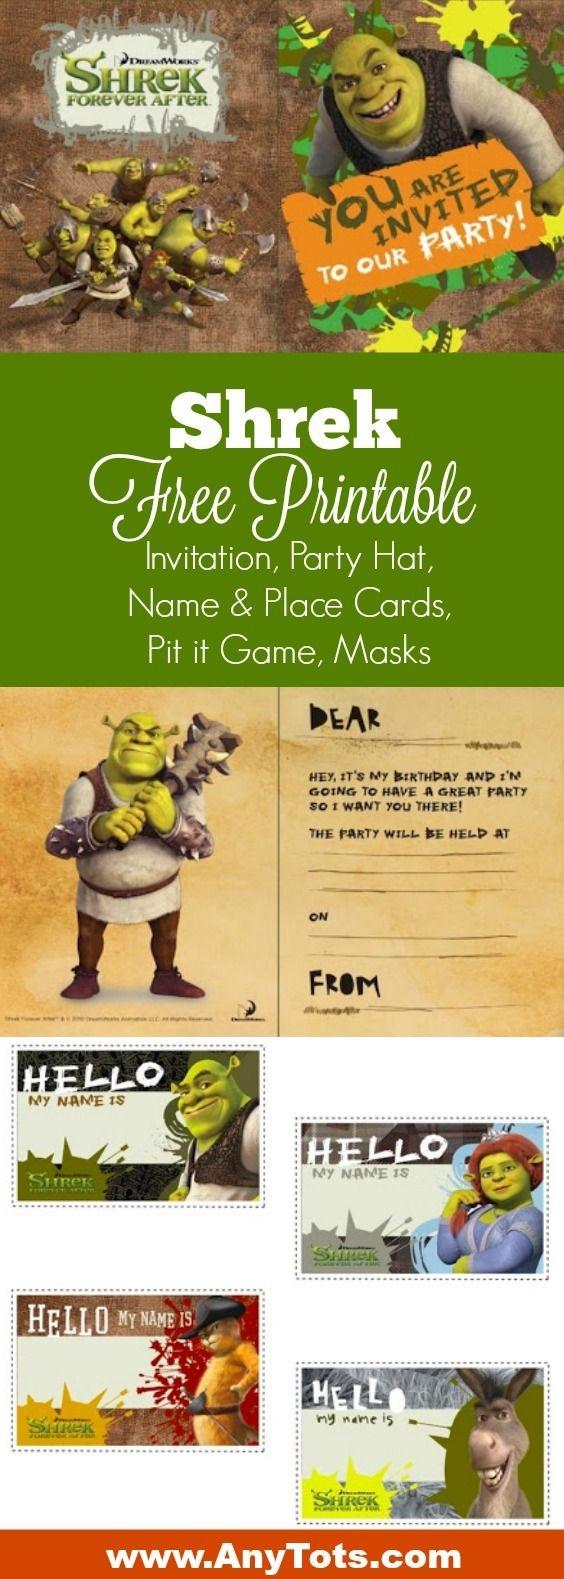 Free Printable Shrek Birthday Party: Invitation, Game, Party Hat - Free Printable Shrek Birthday Invitations